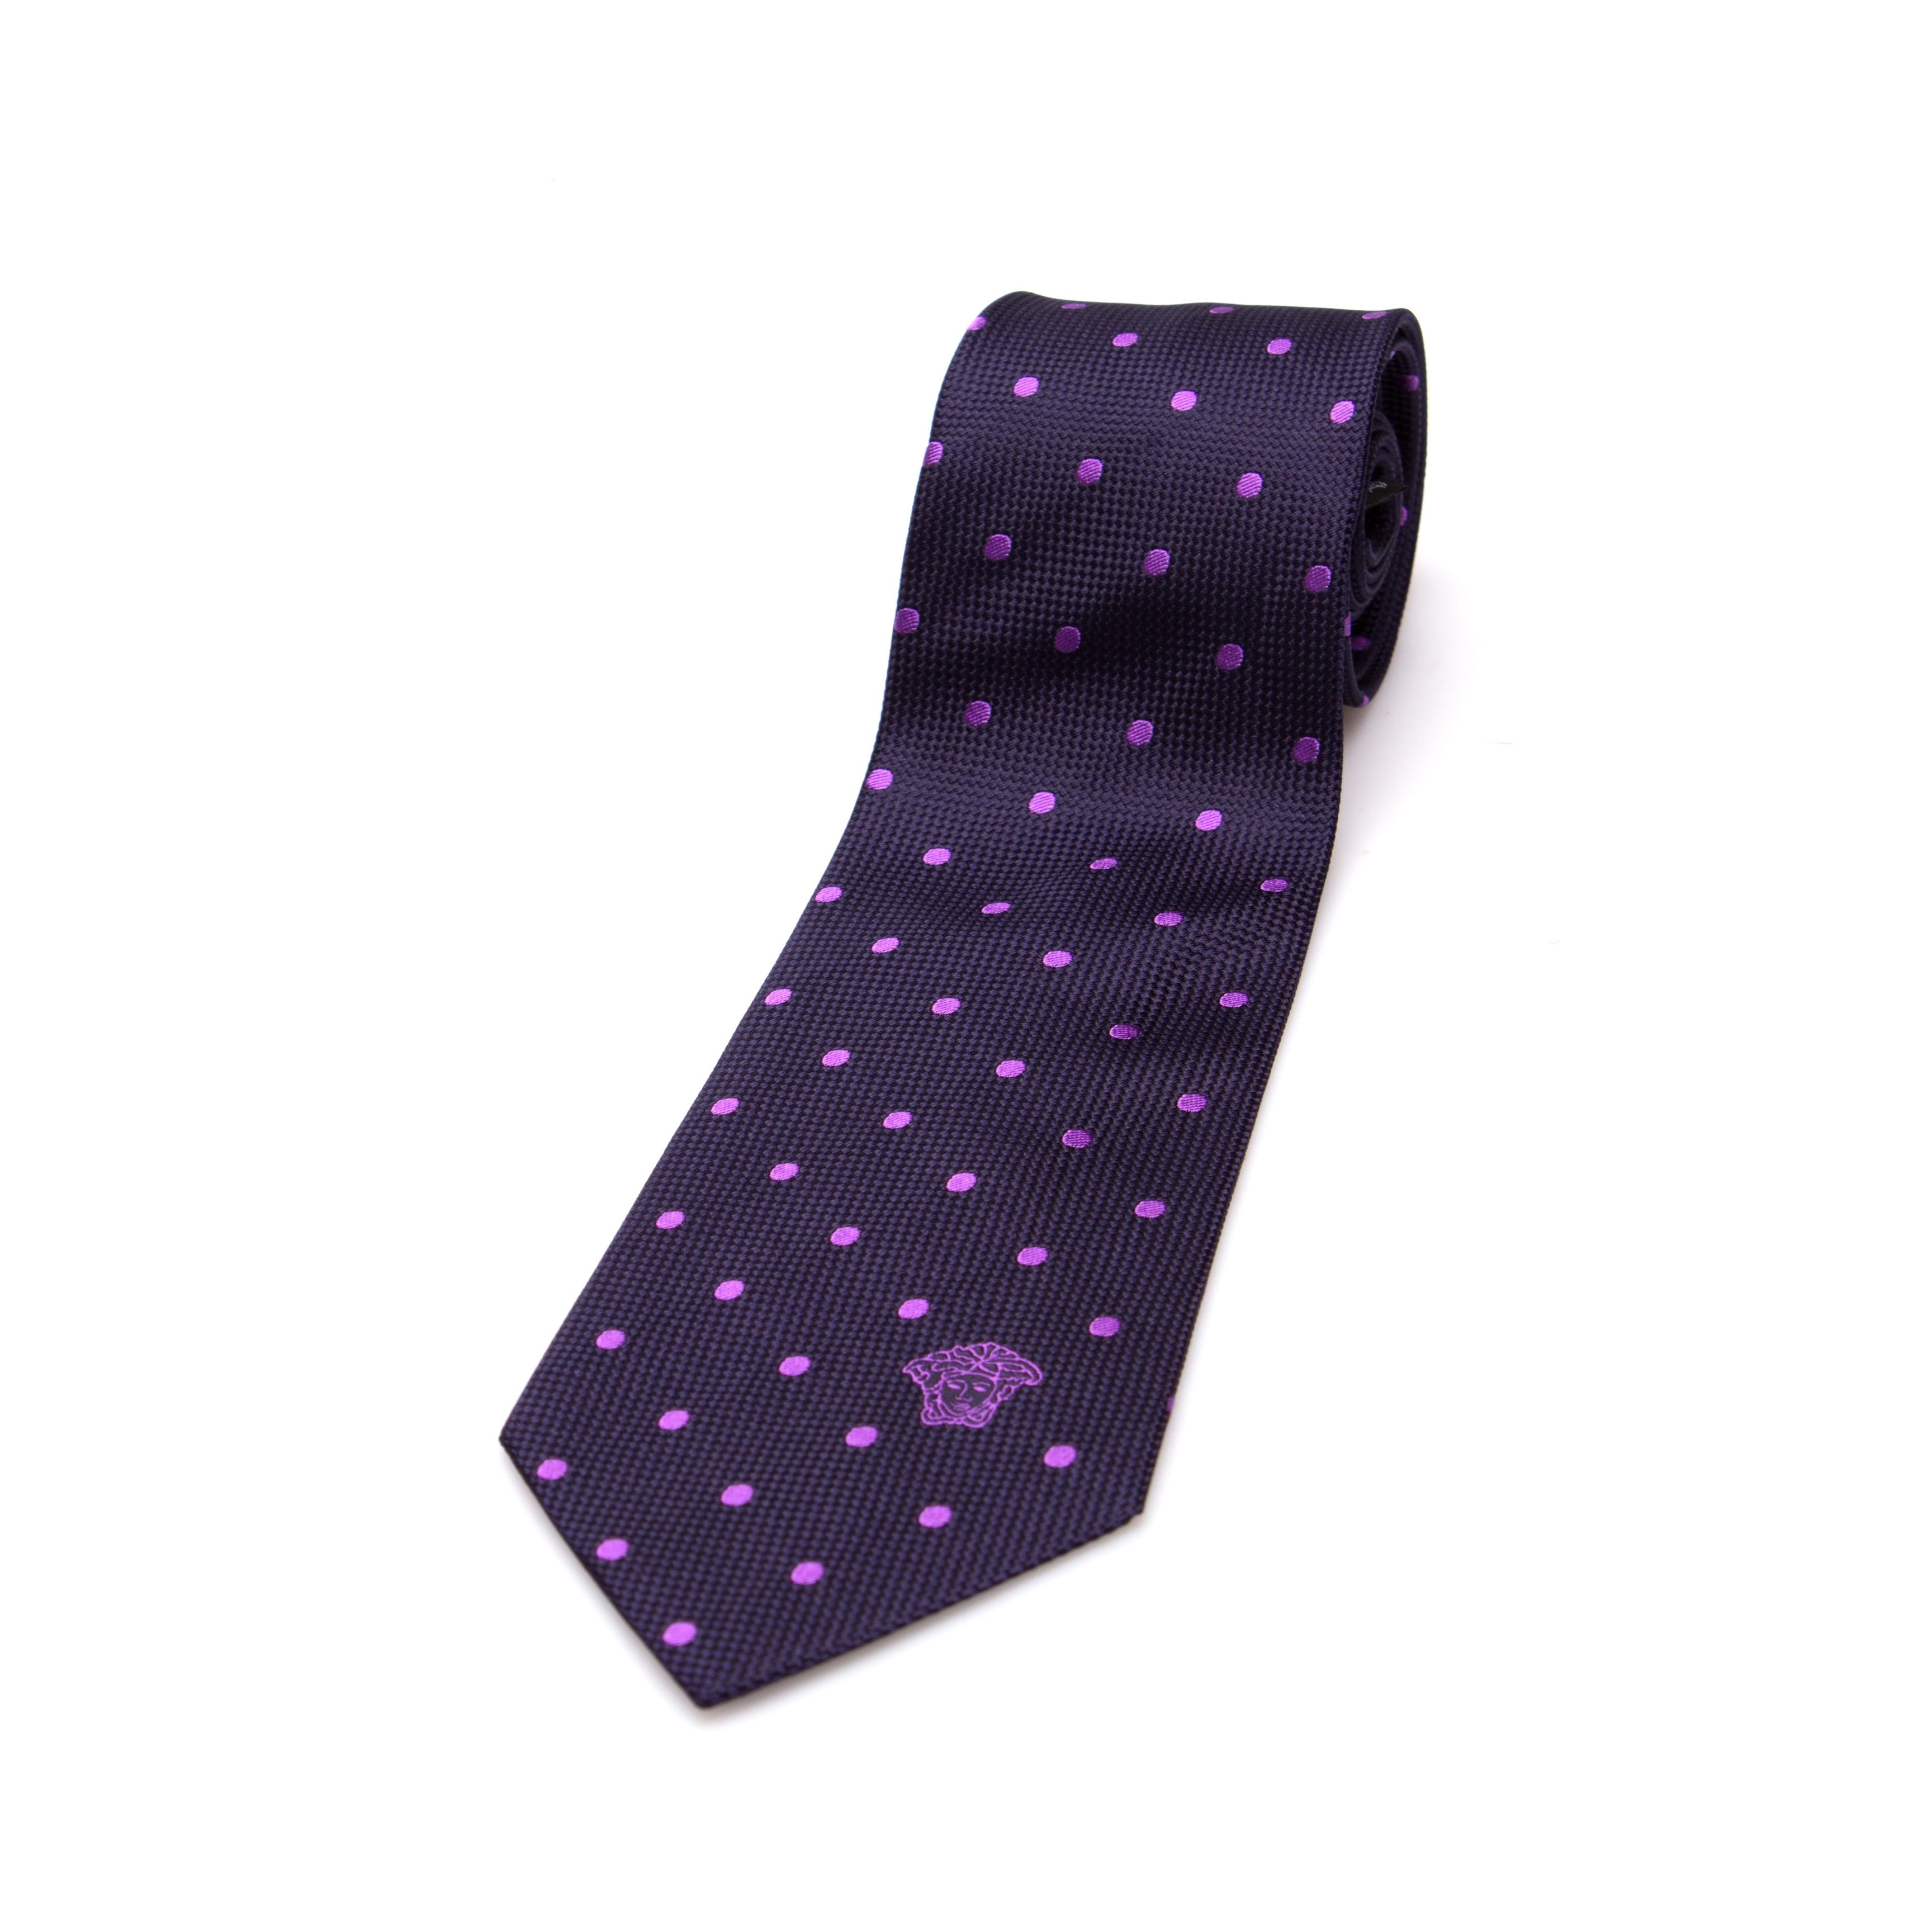 Versace Men's Medusa Head Slim Silk Necktie - Thumbnail 0